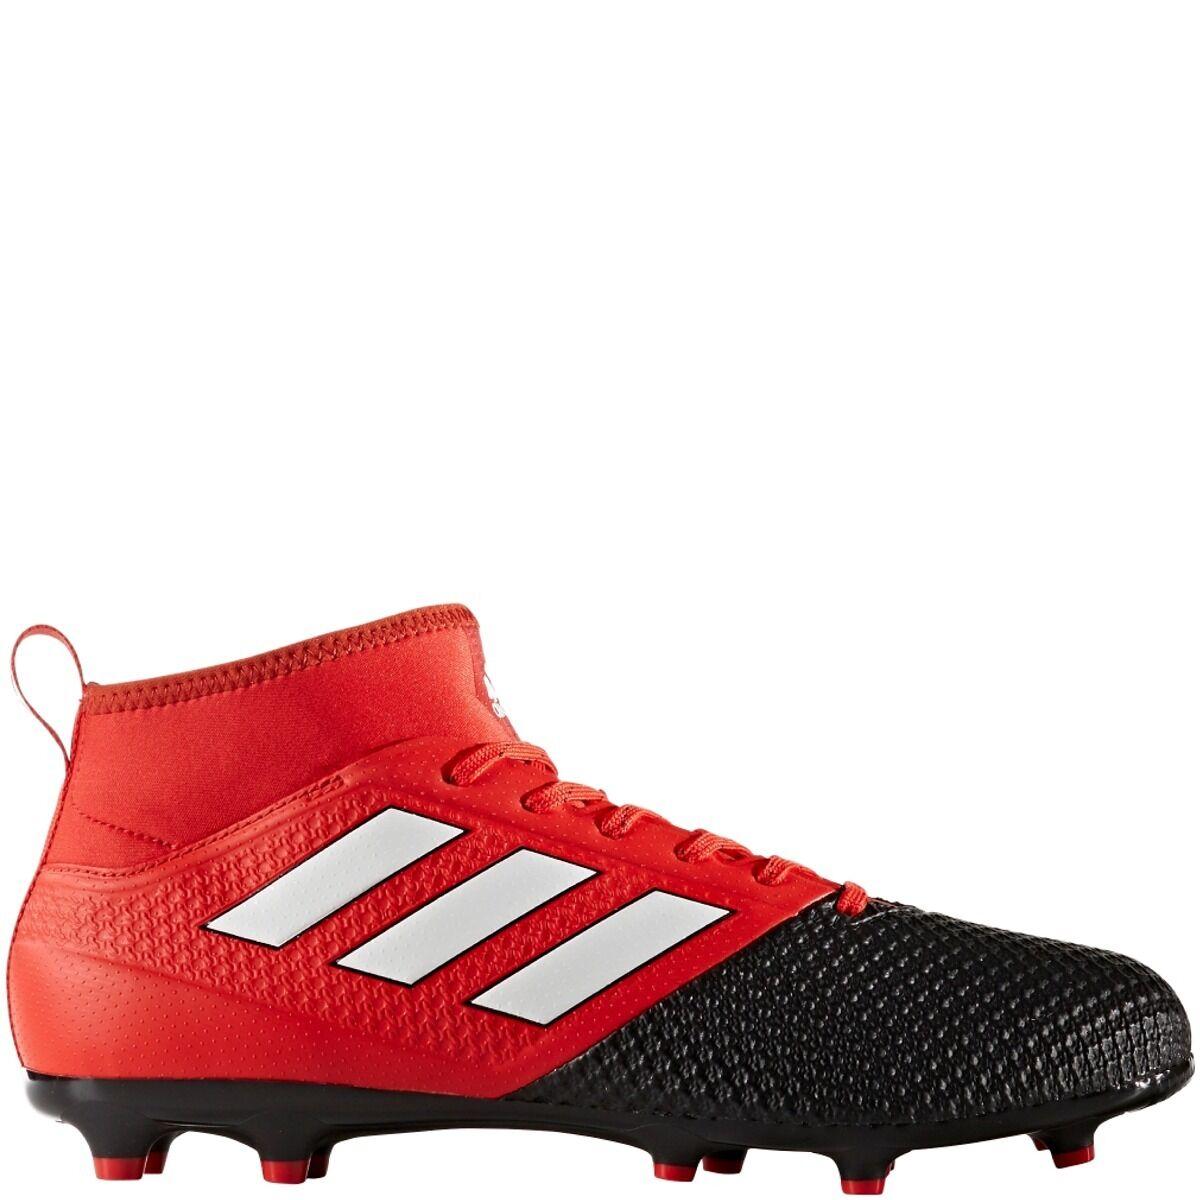 Adidas Ace 17.3 Primemesh Mens Football Stiefel (BA8506)